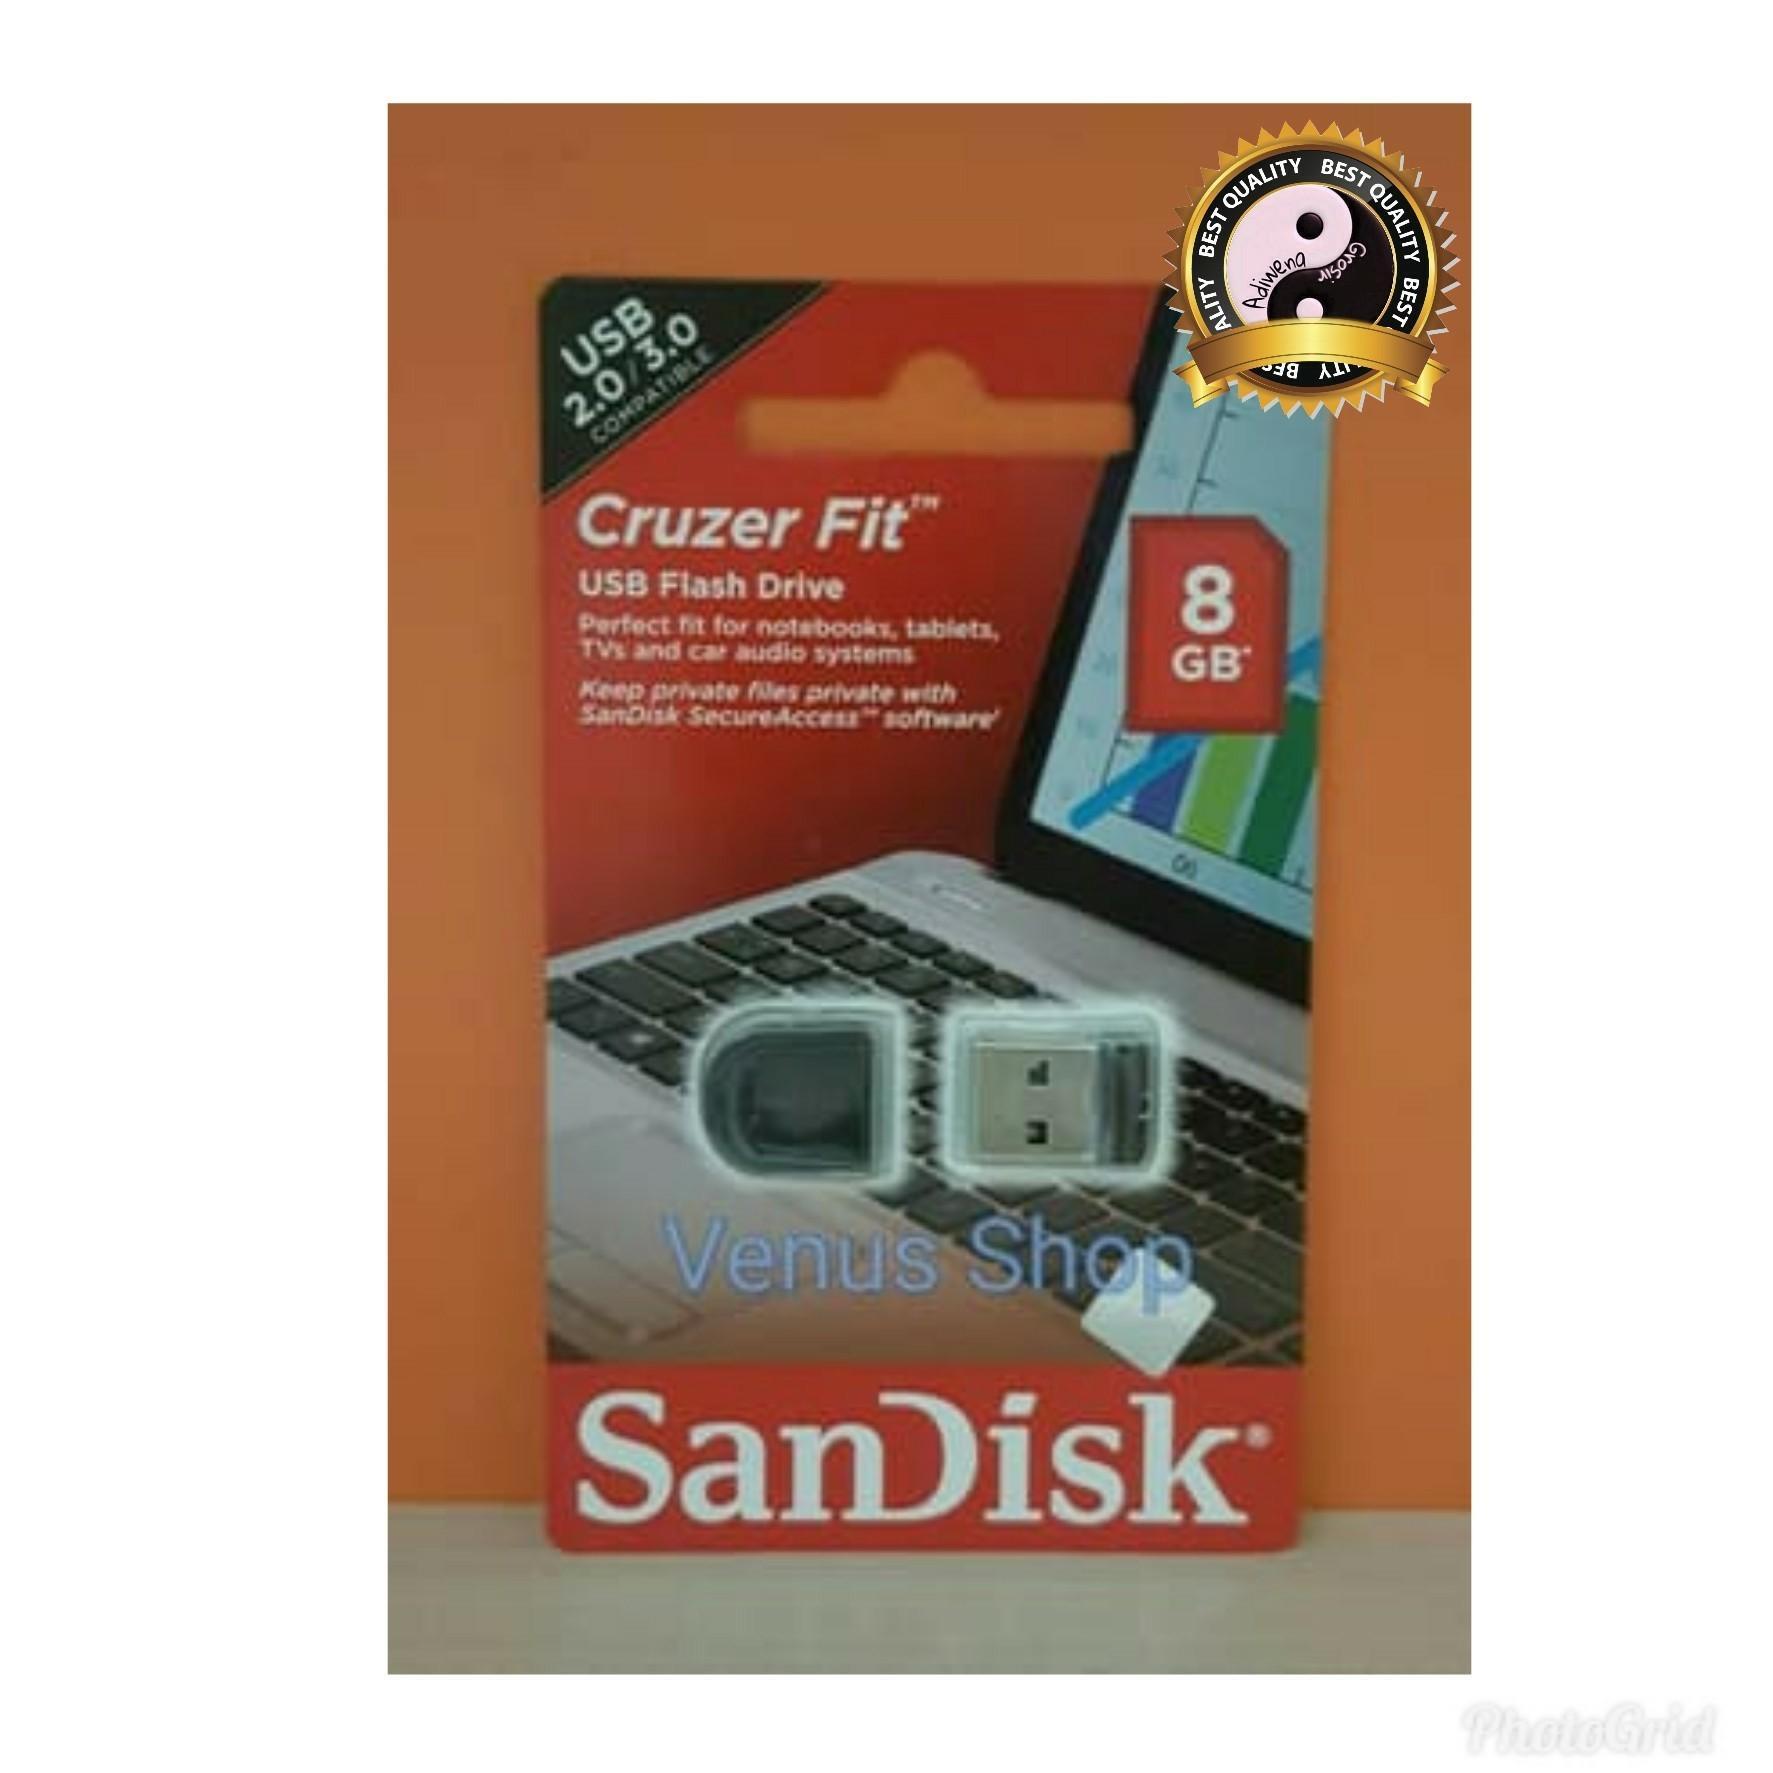 Buy Sell Cheapest Flashdisk Sandisk 8 Best Quality Product Deals Flasdisk 8gb Gb Original Promo Usb Cruzer Fit Cz33 Memory Cz 33